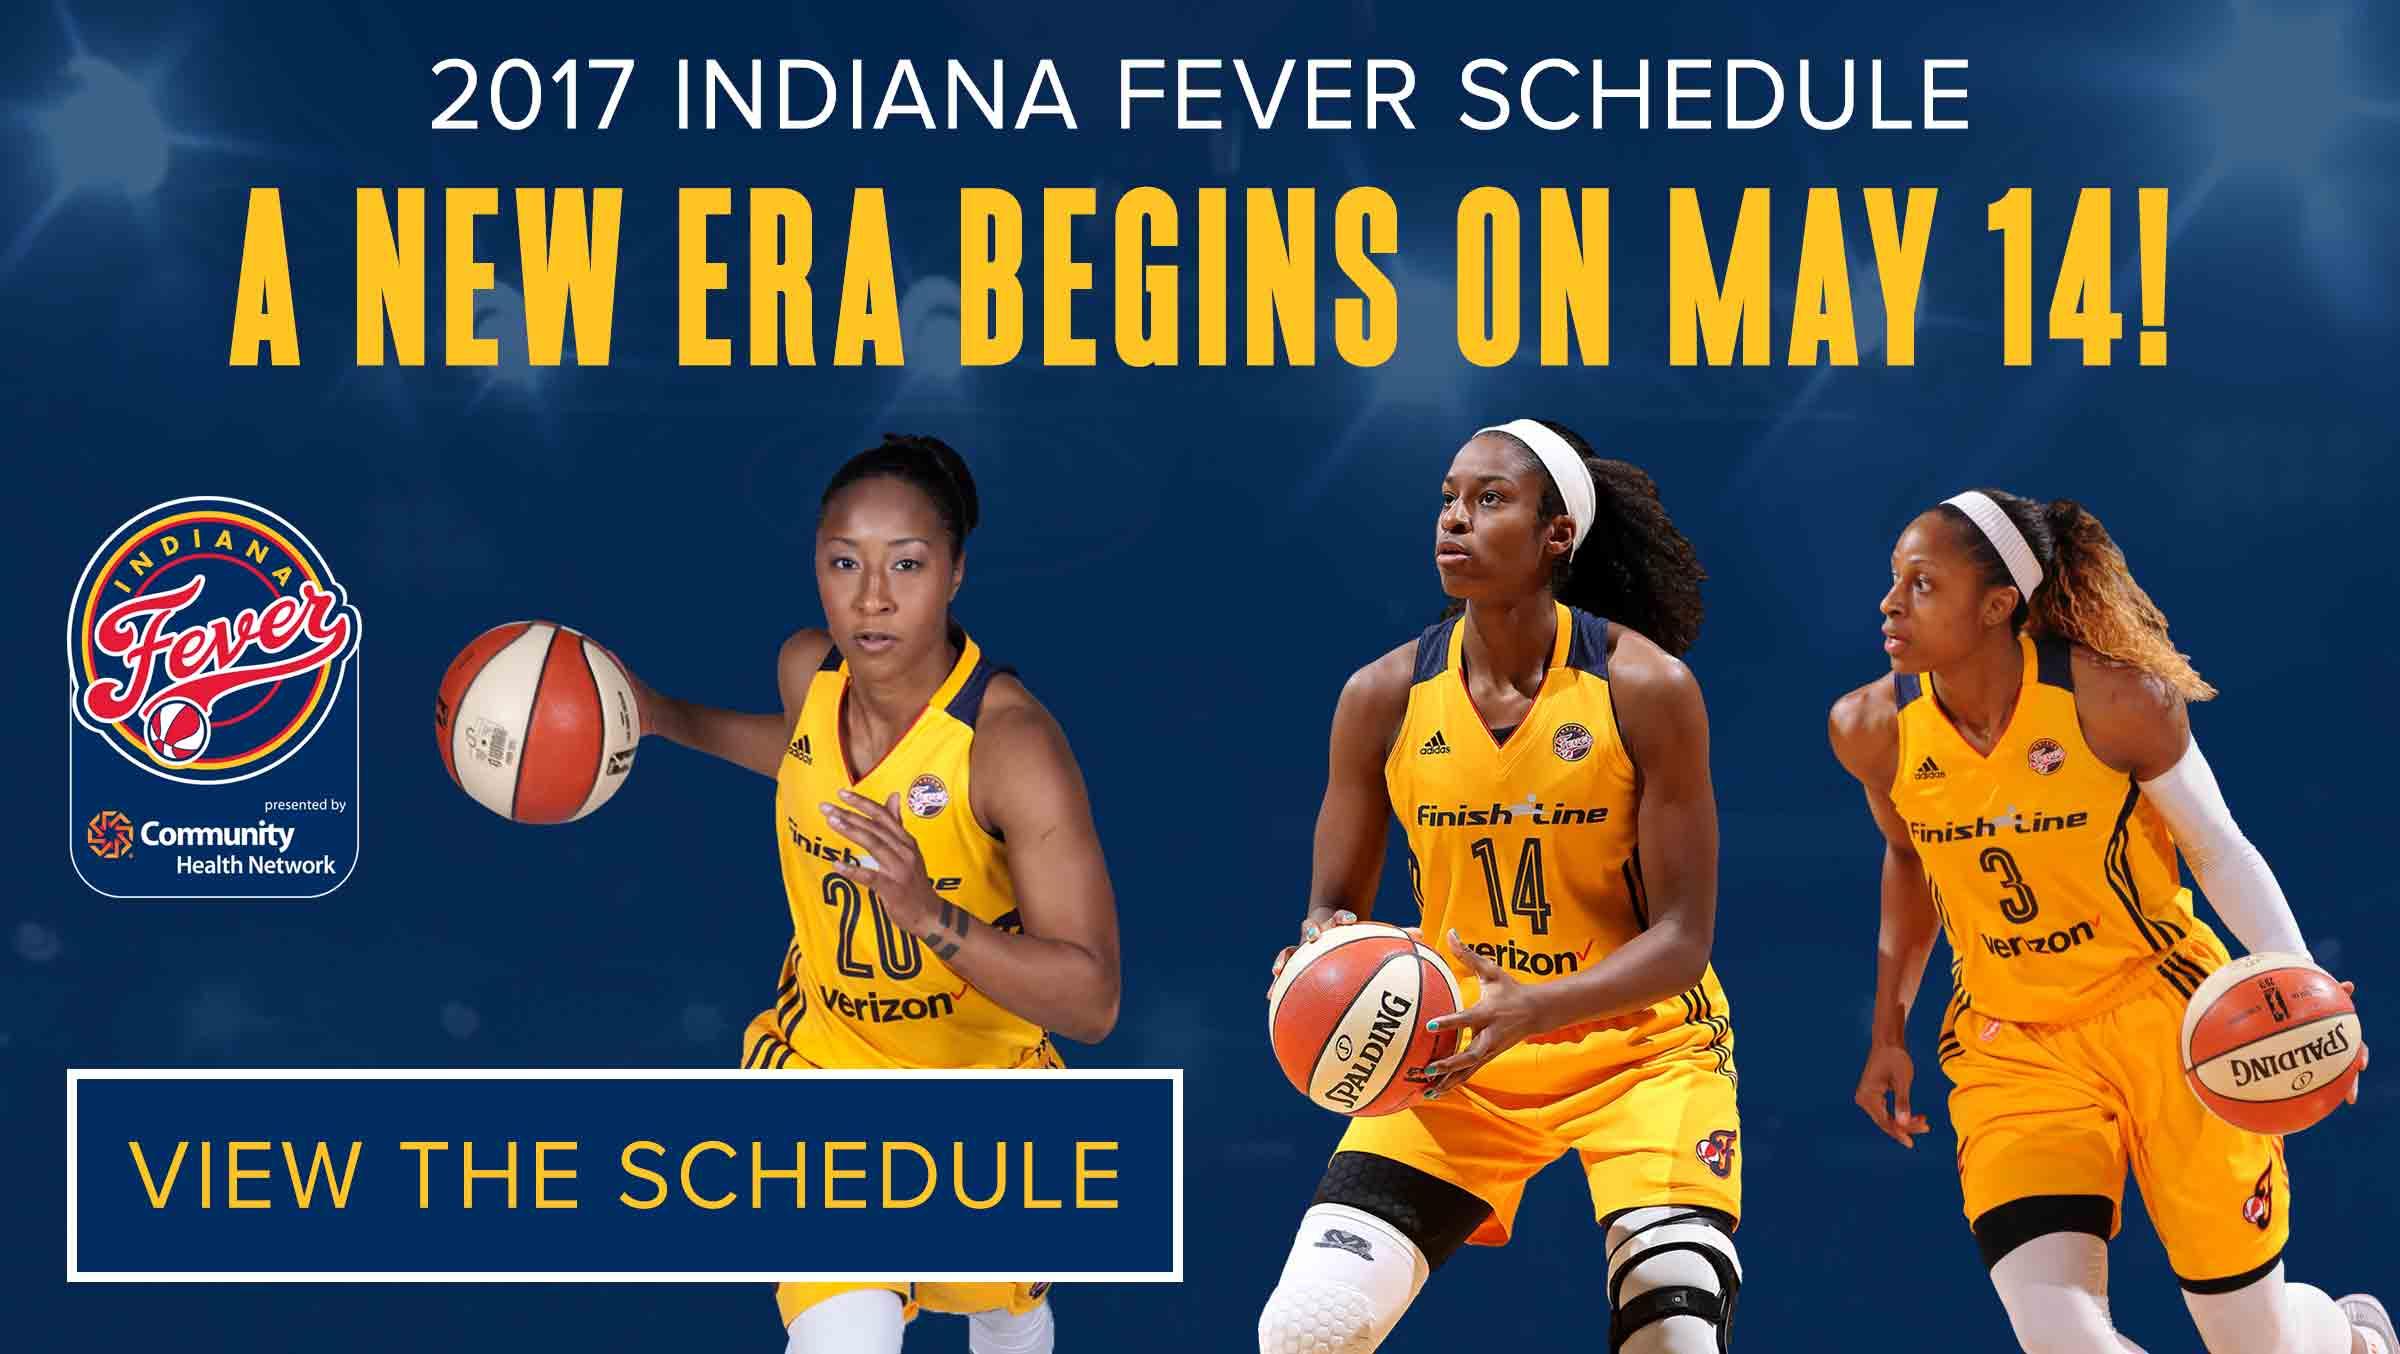 2017 Indiana Fever Schedule